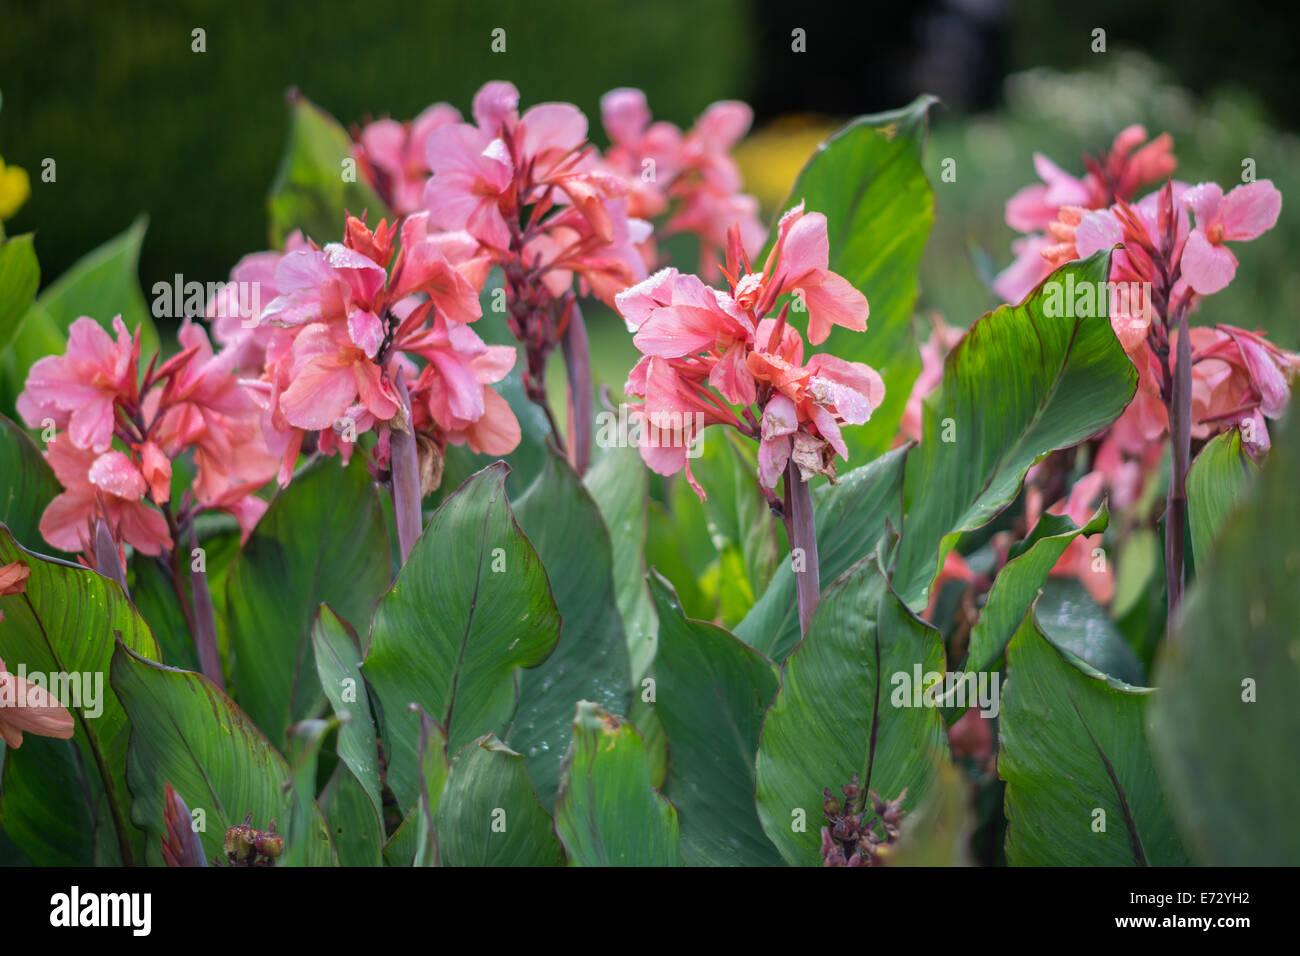 rosa canna lily blumen stockfoto bild 73209614 alamy. Black Bedroom Furniture Sets. Home Design Ideas